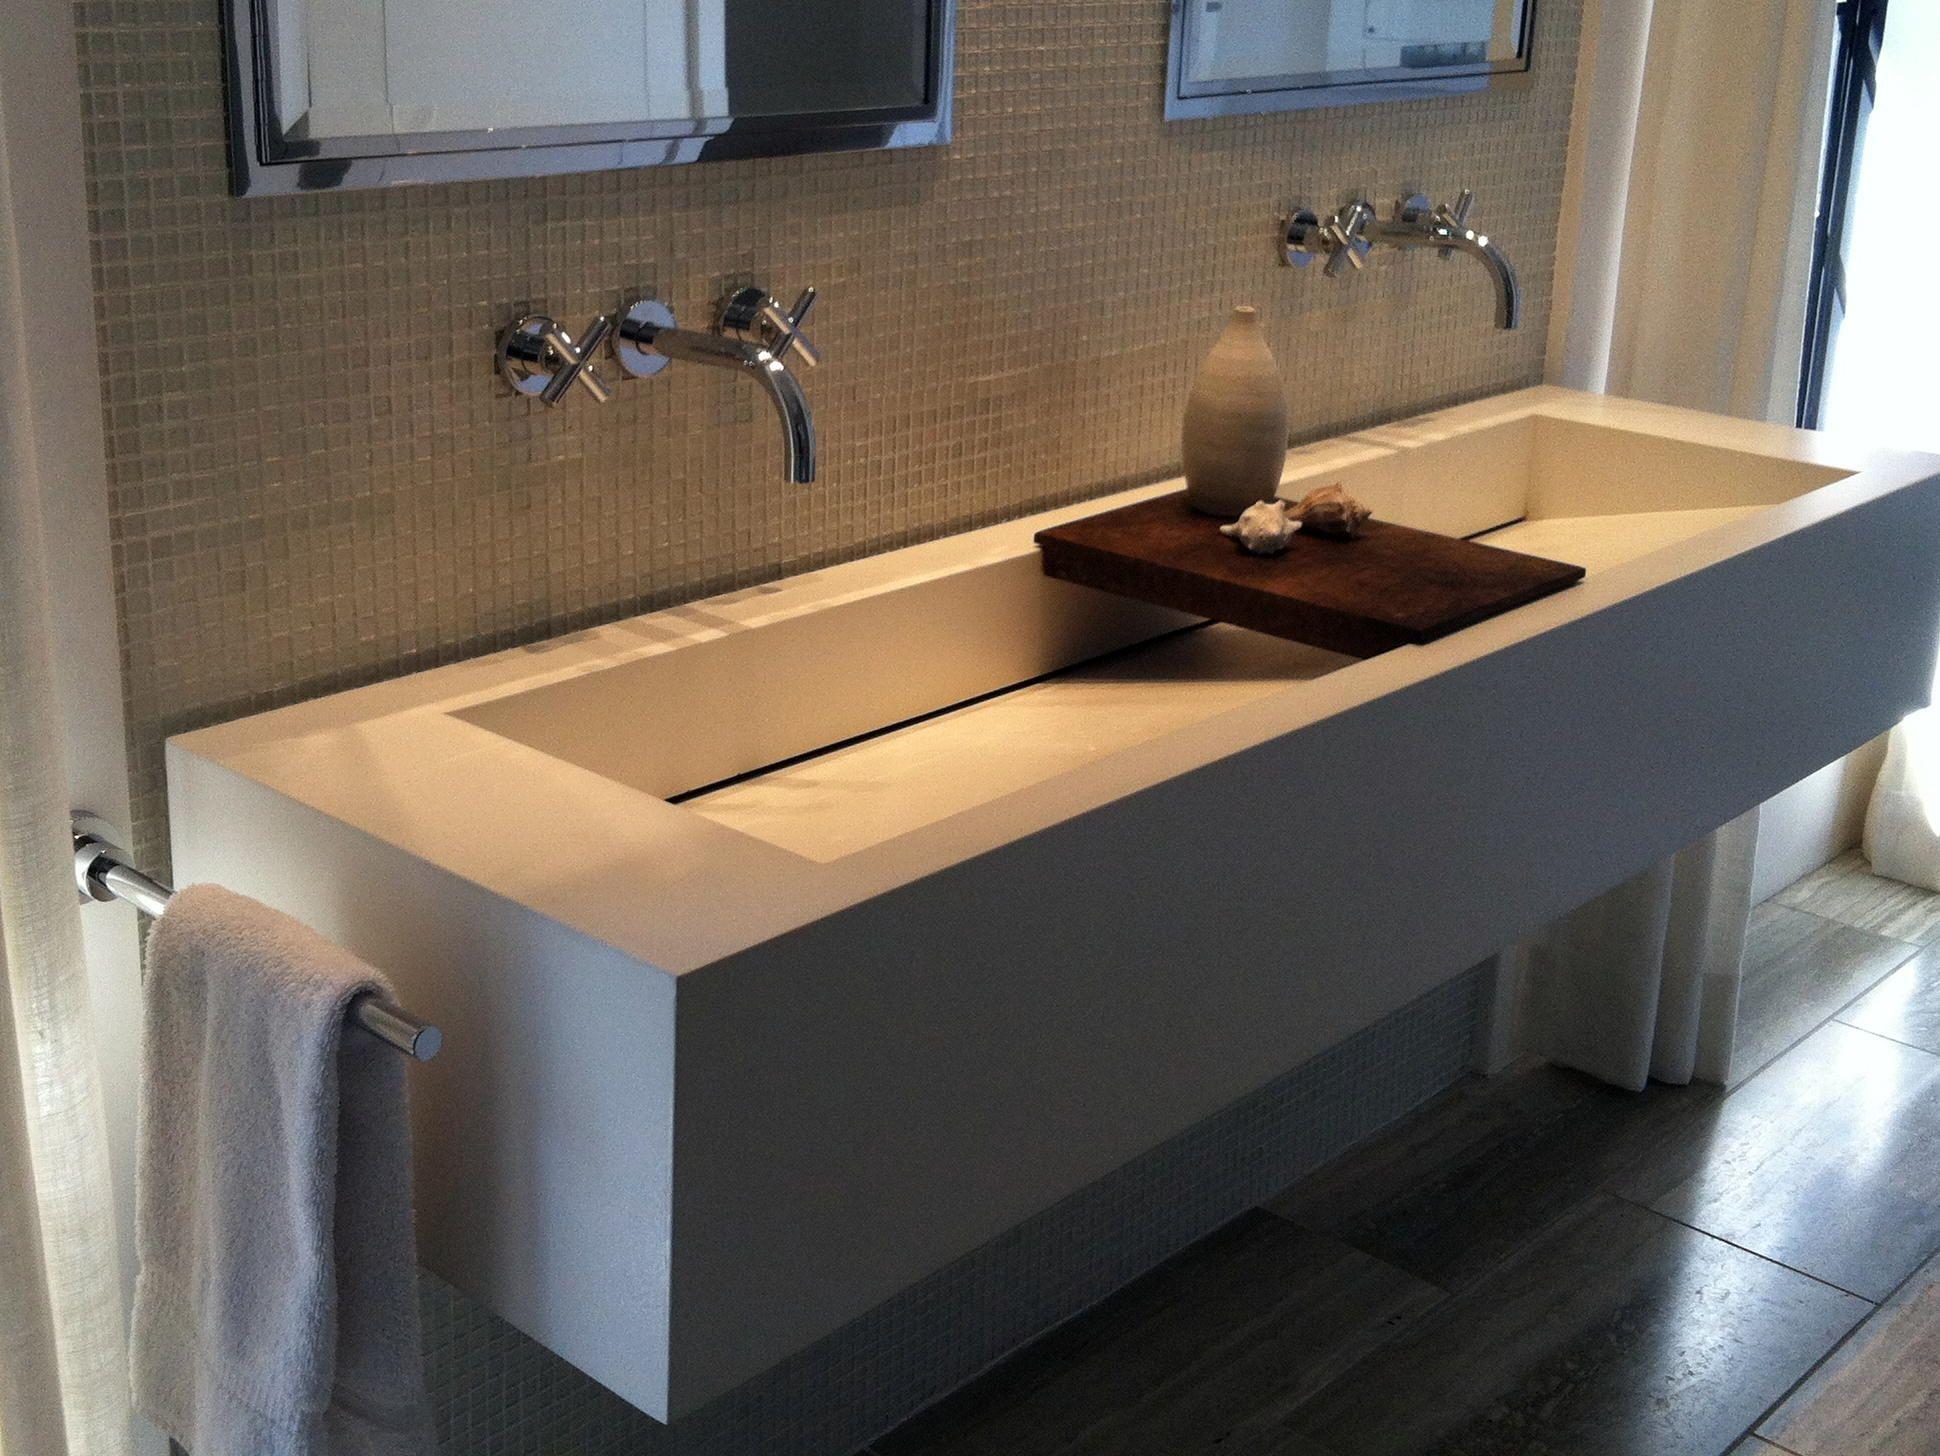 51 trough sinks ideas trough sink